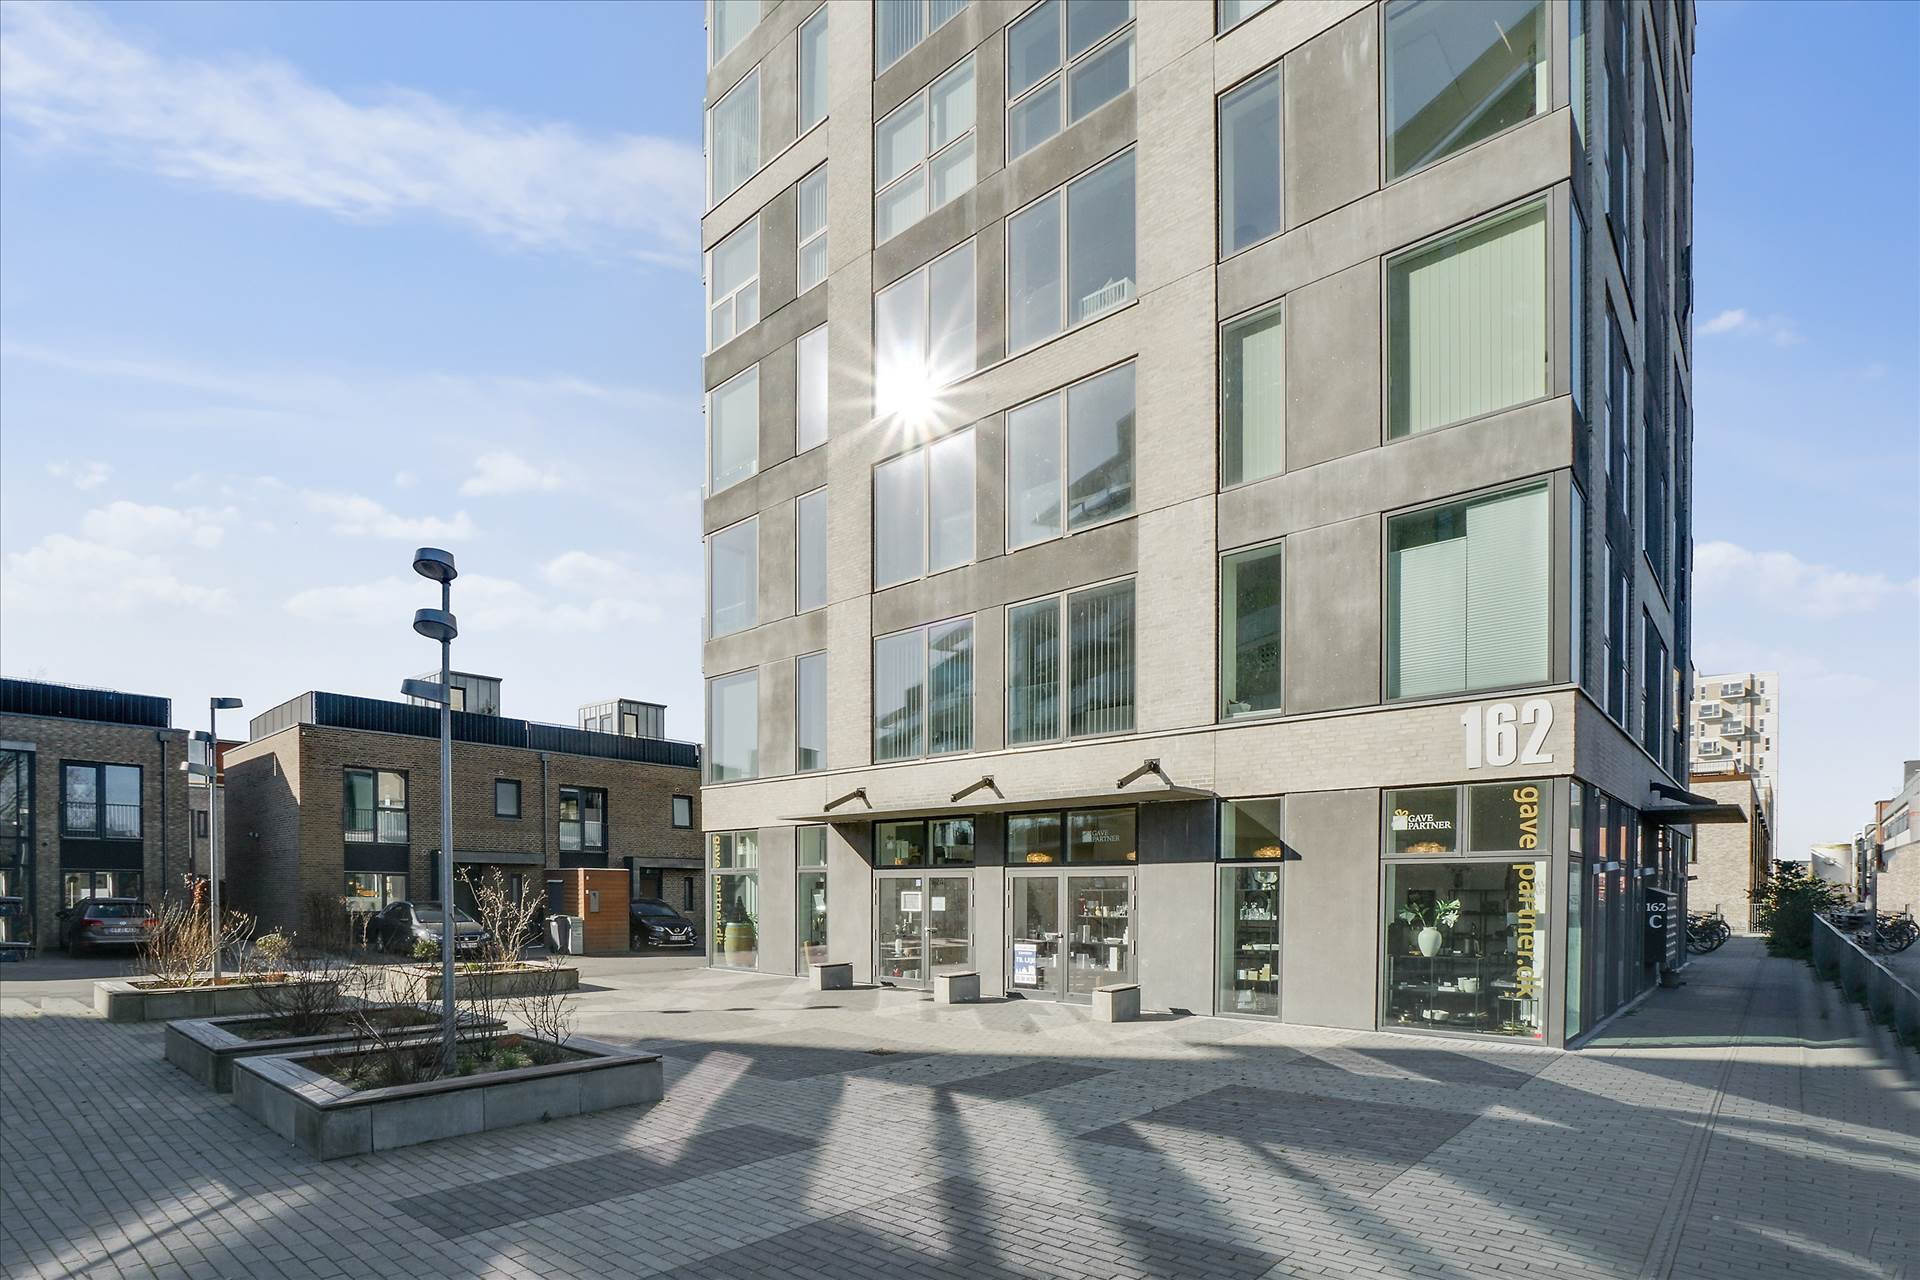 139 m² butik – Amager Strand